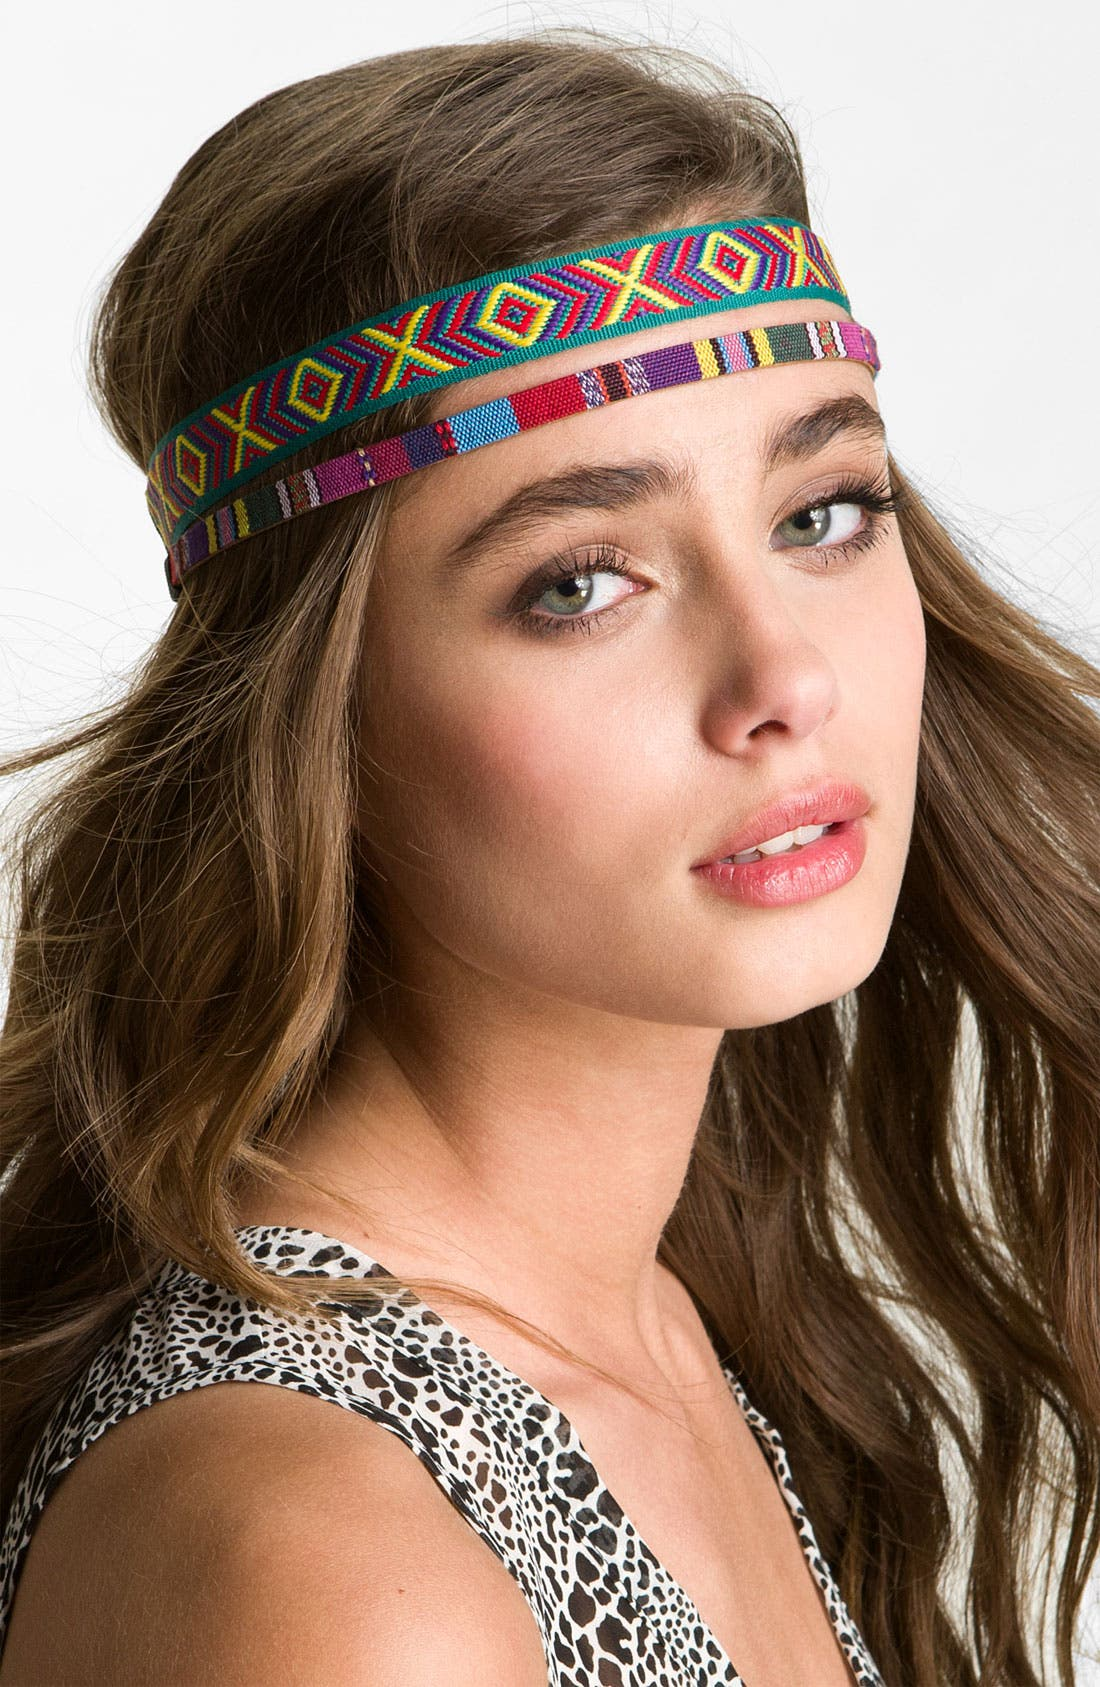 Alternate Image 1 Selected - Carole Woven Ethnic Headbands (Set of 2)